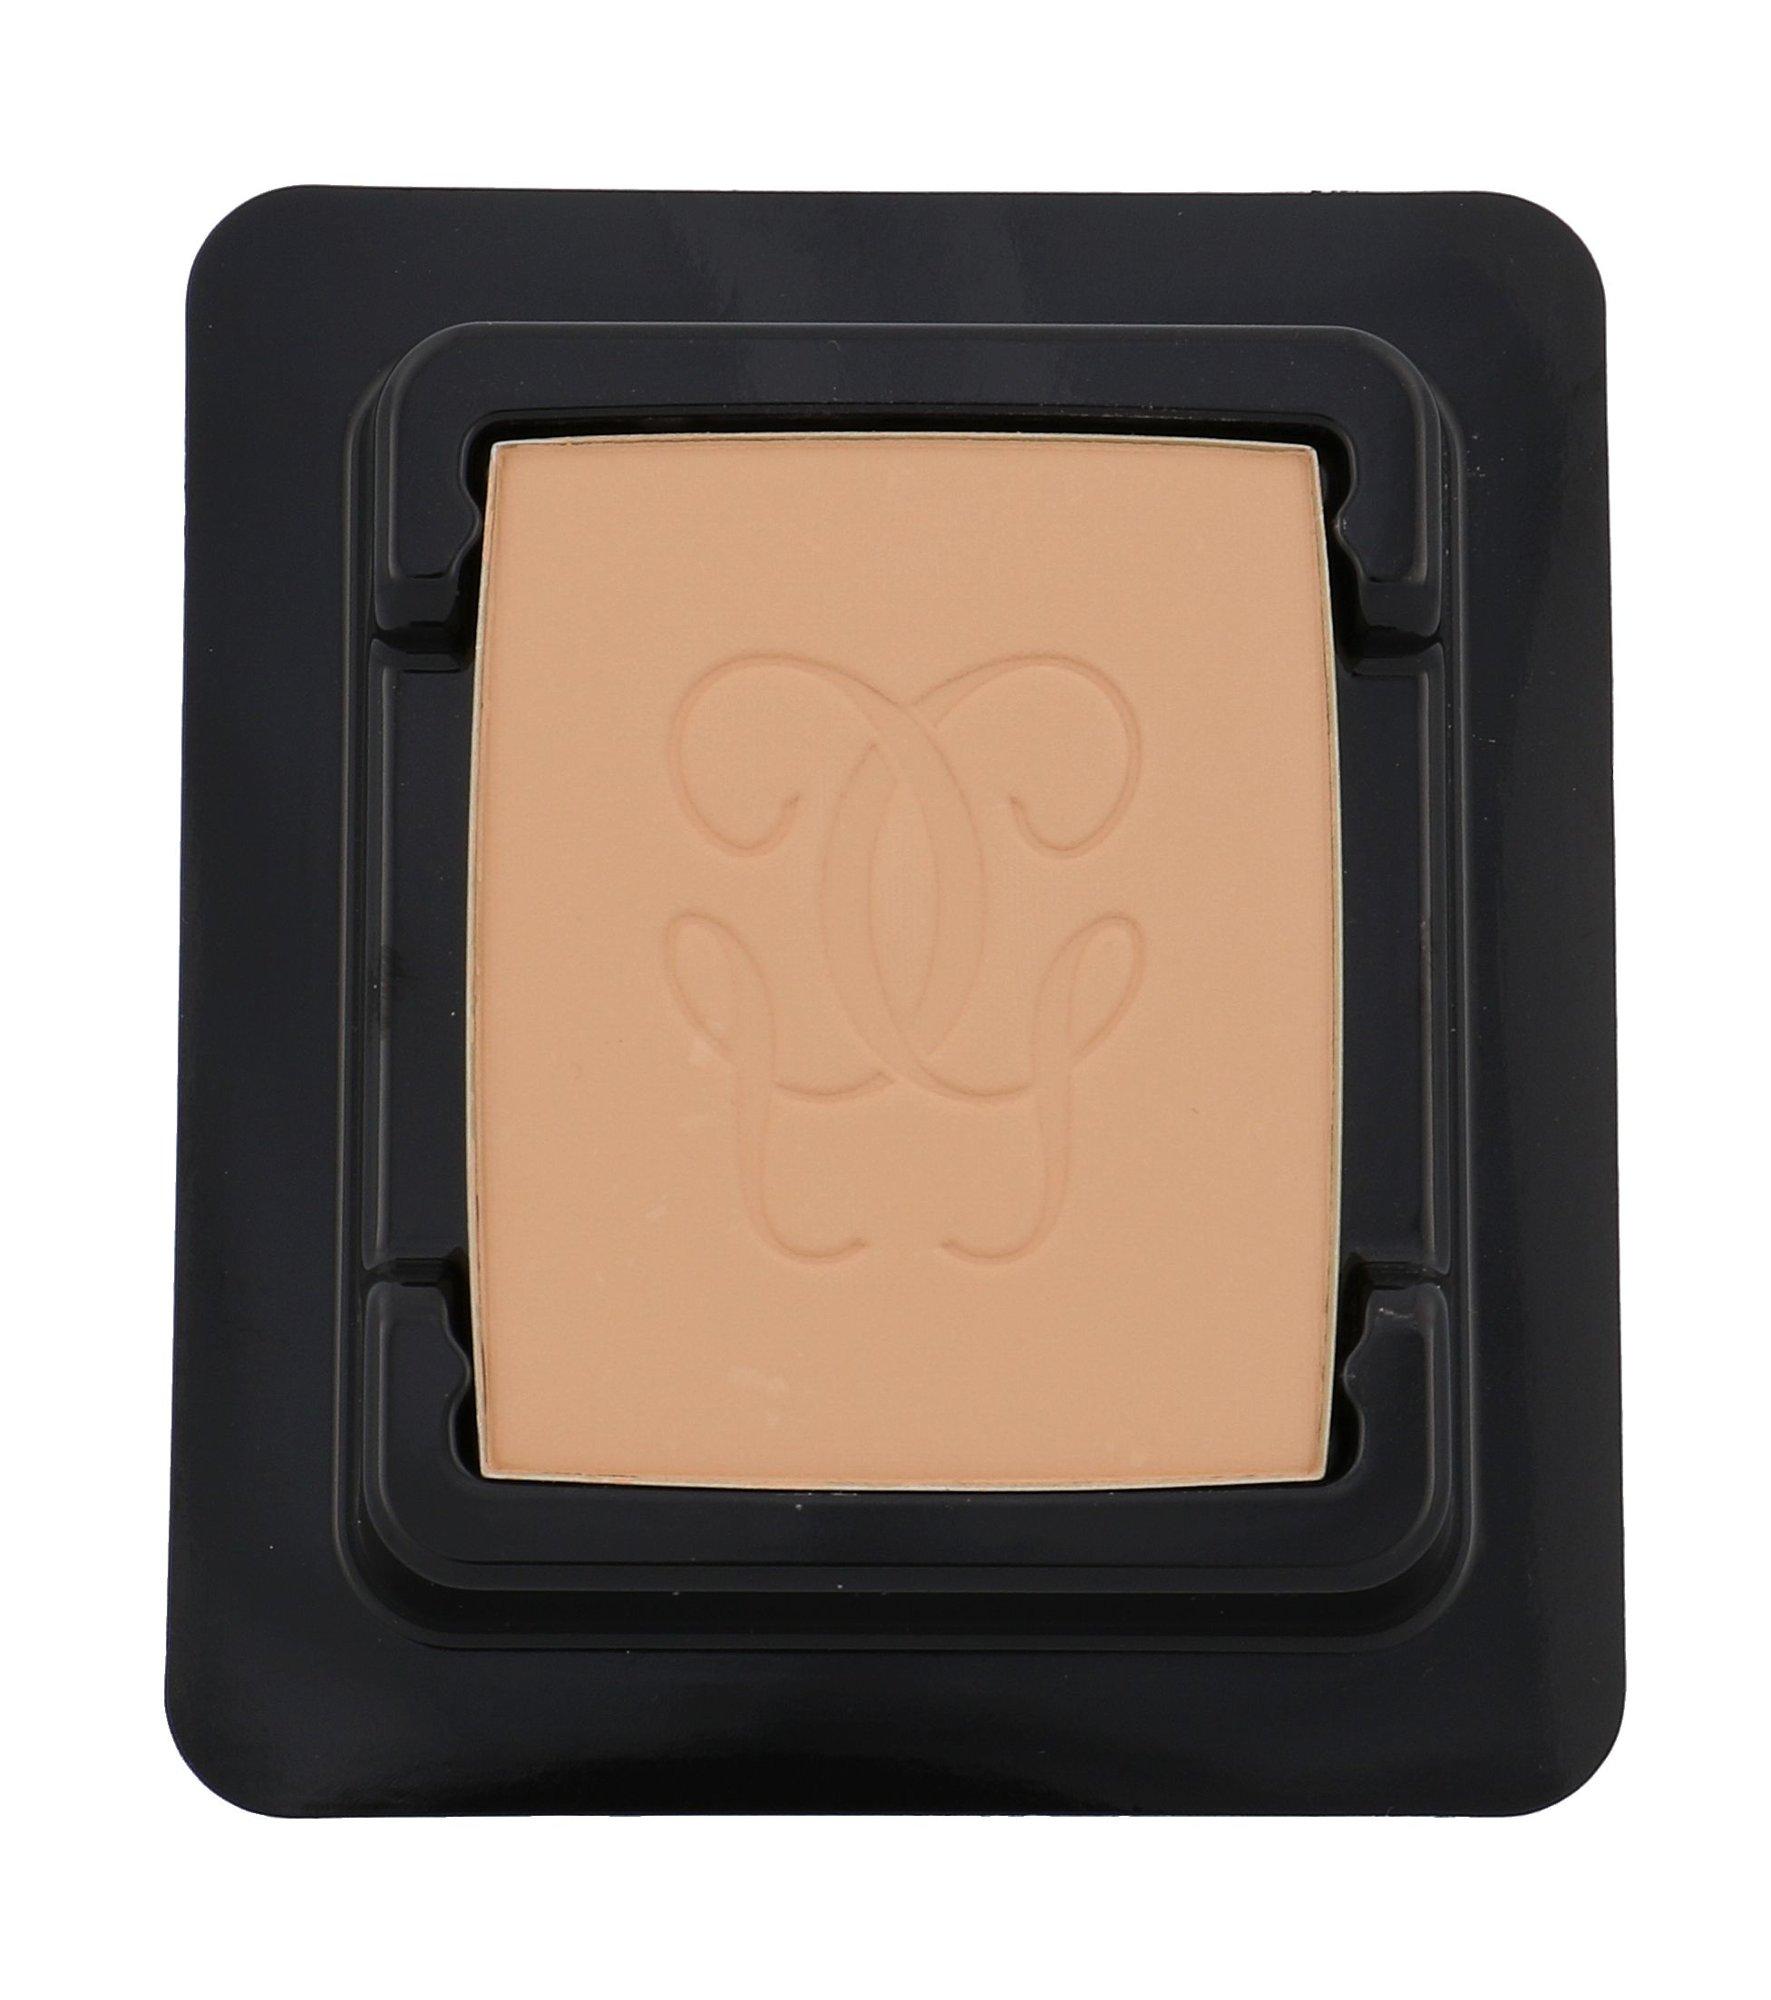 Guerlain Parure Gold Makeup 10ml 03 Natural Beige